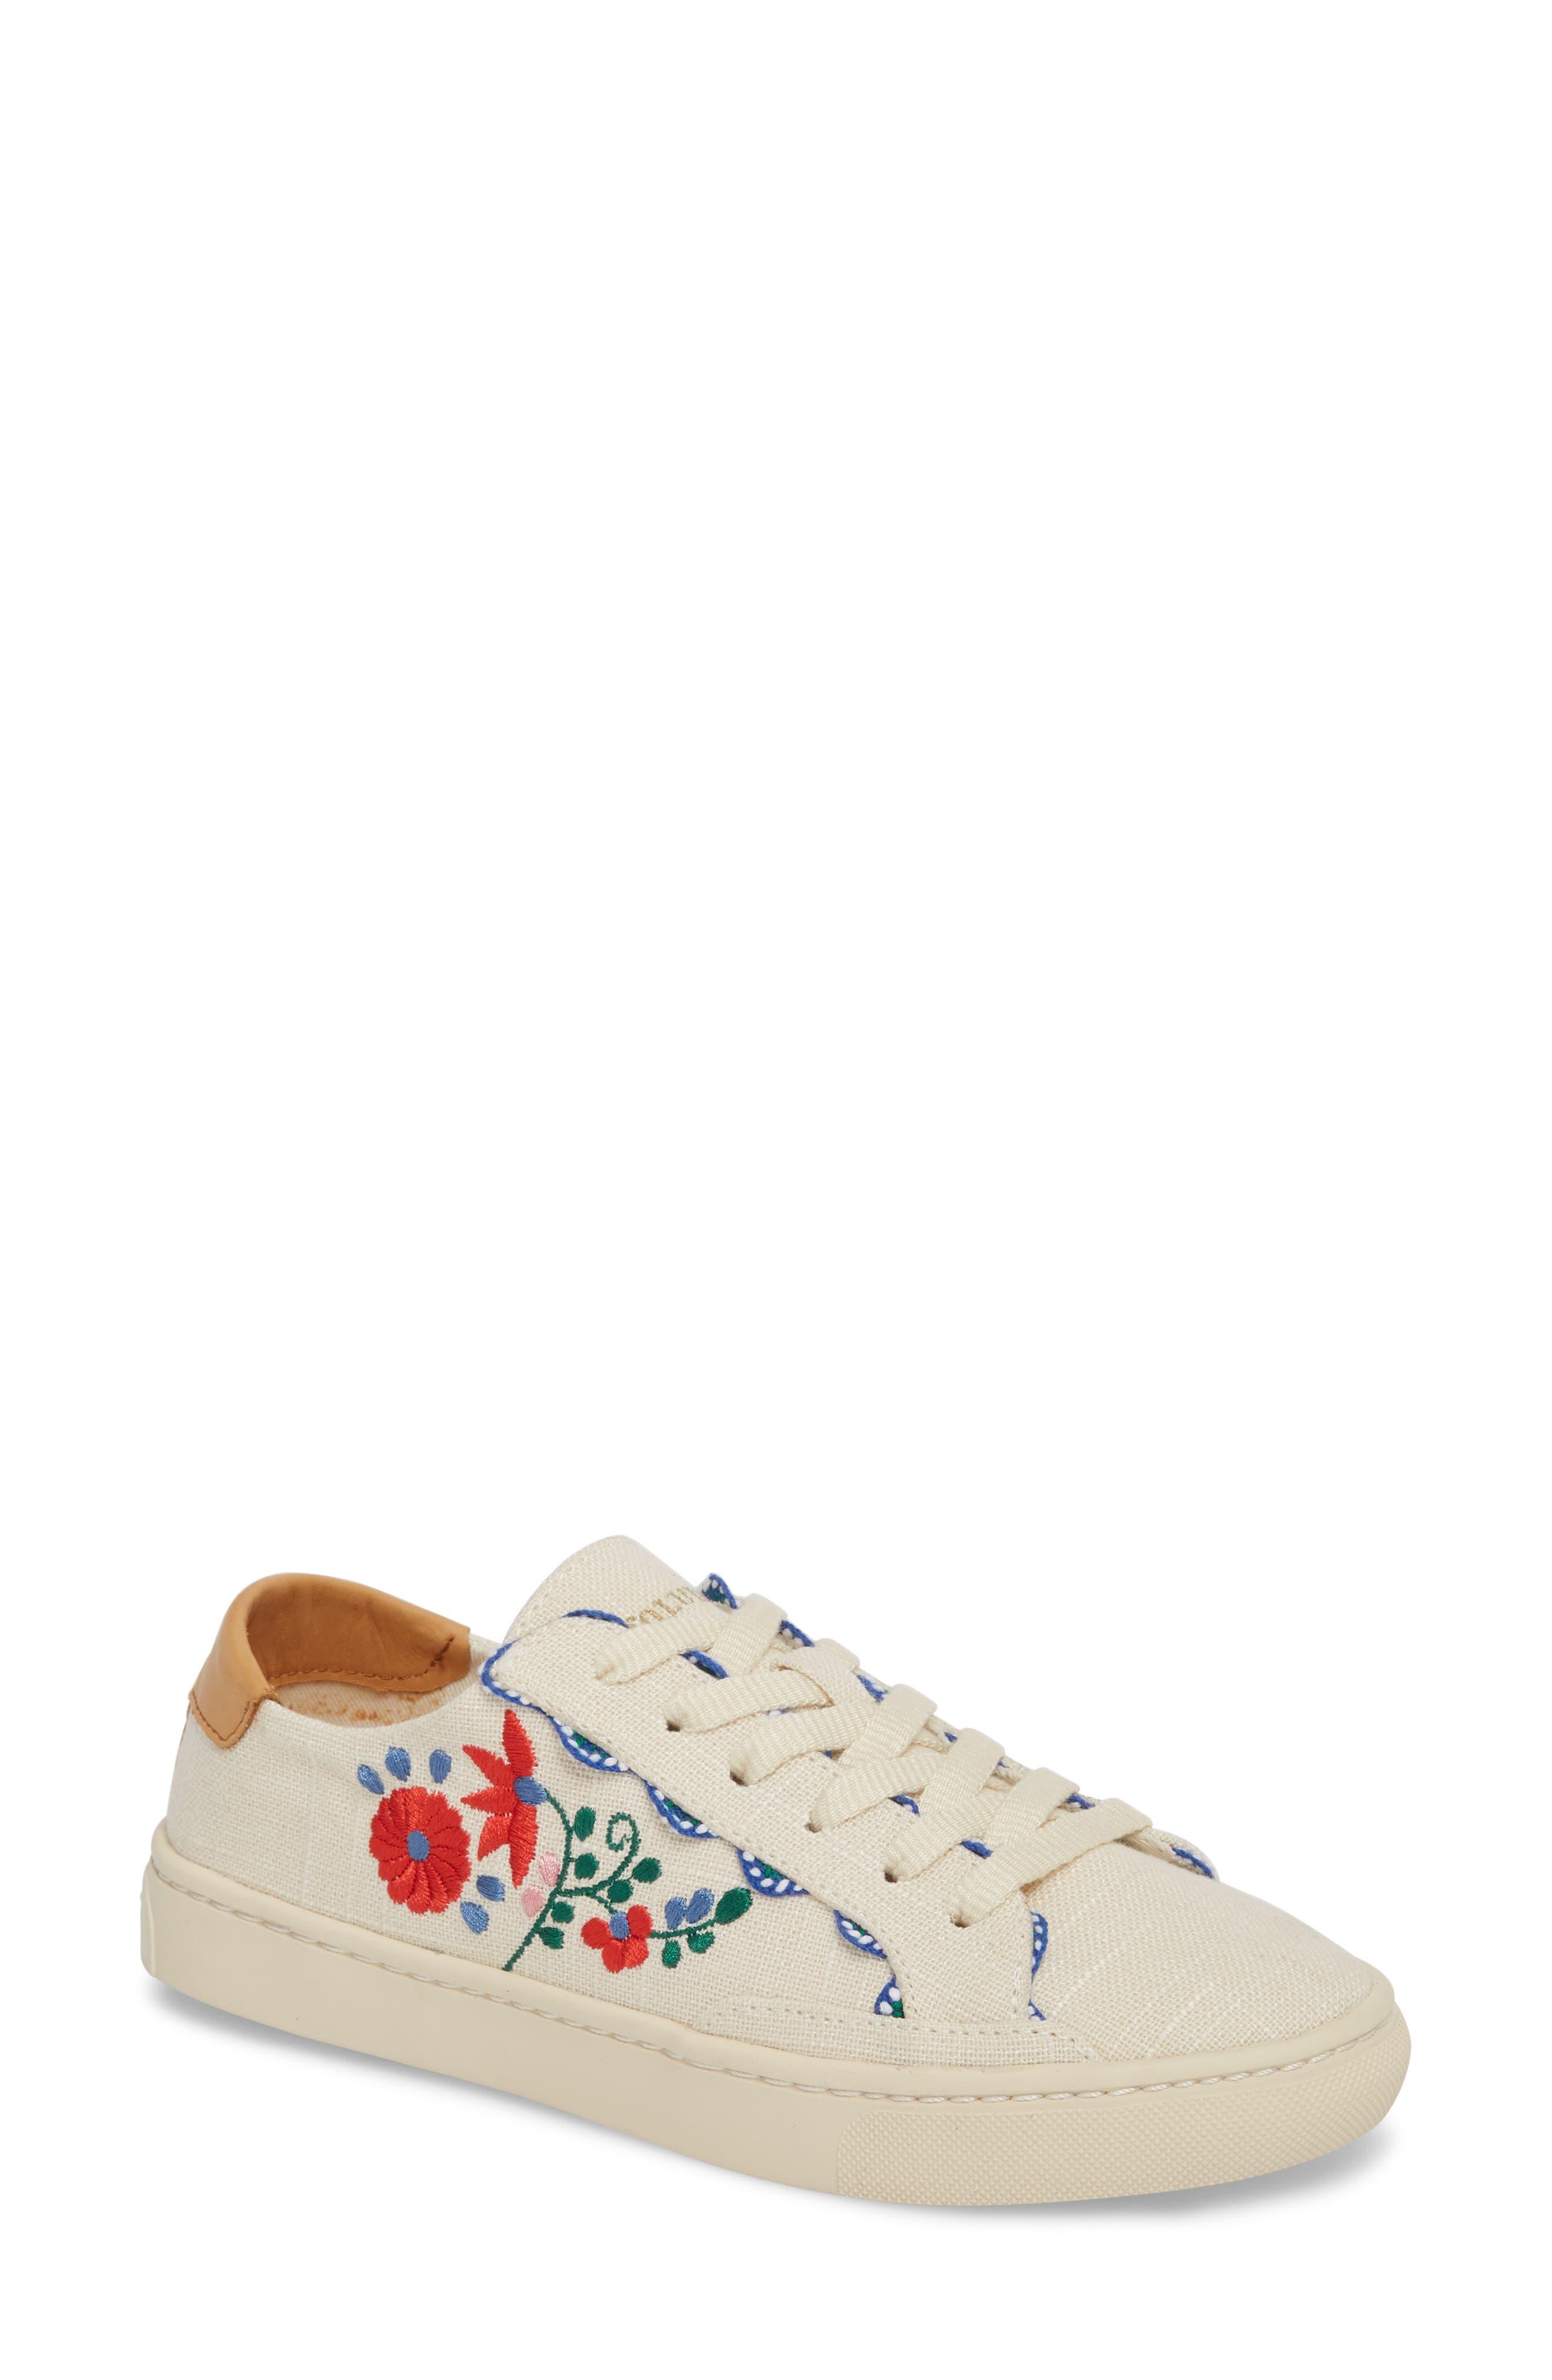 Ibiza Embroidered Sneaker,                         Main,                         color, 680